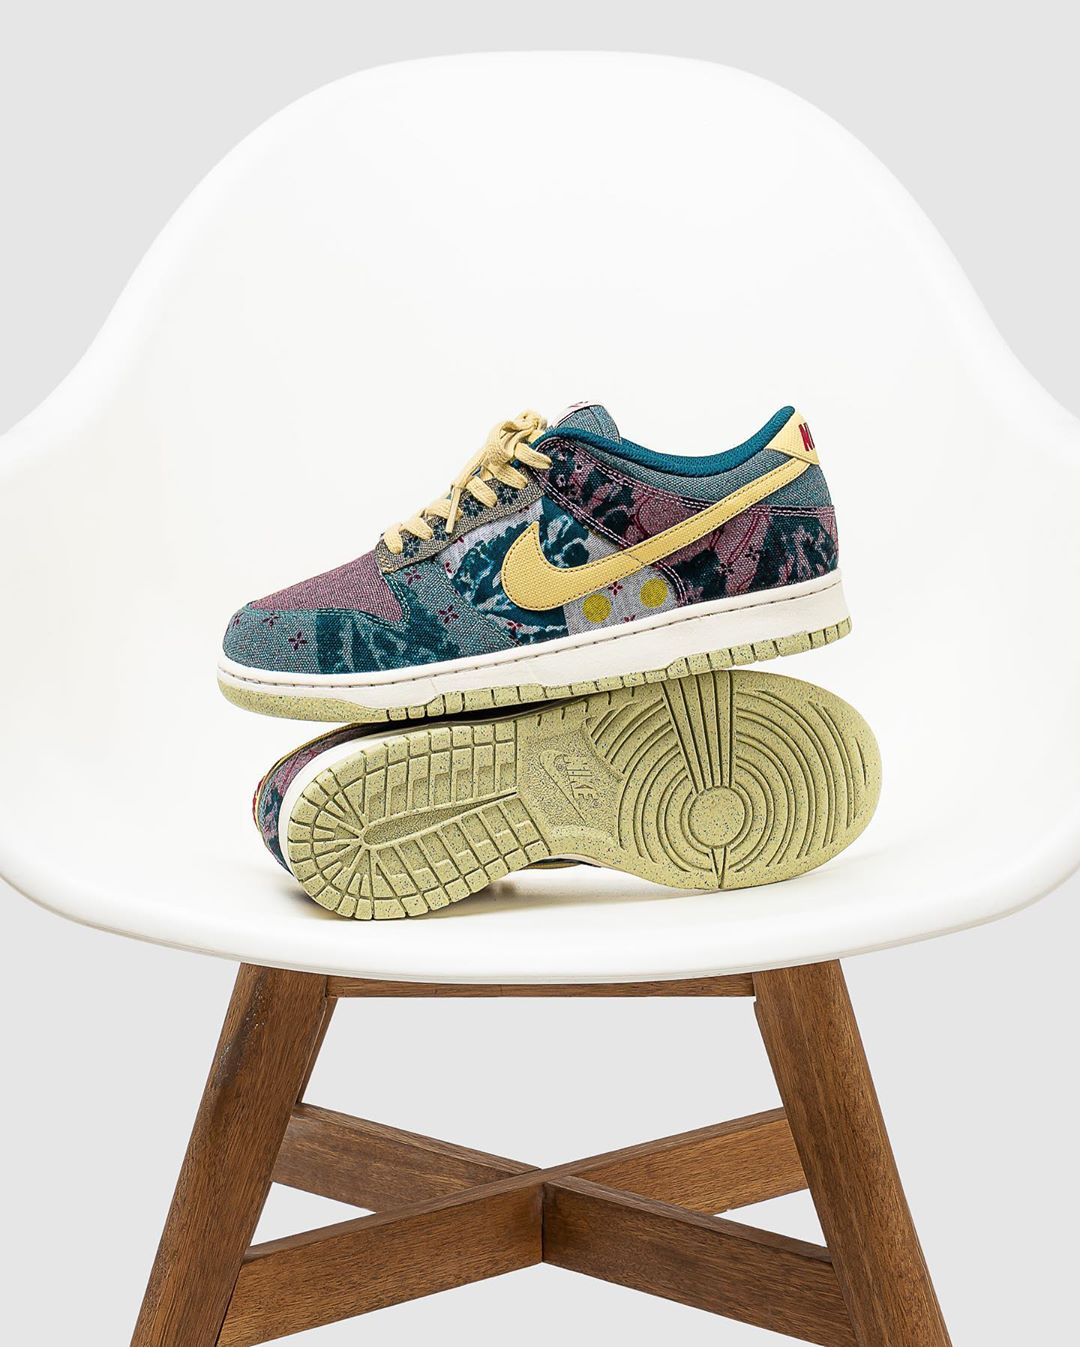 Nike Dunk Low Sp Community Garden Sneaker Myth